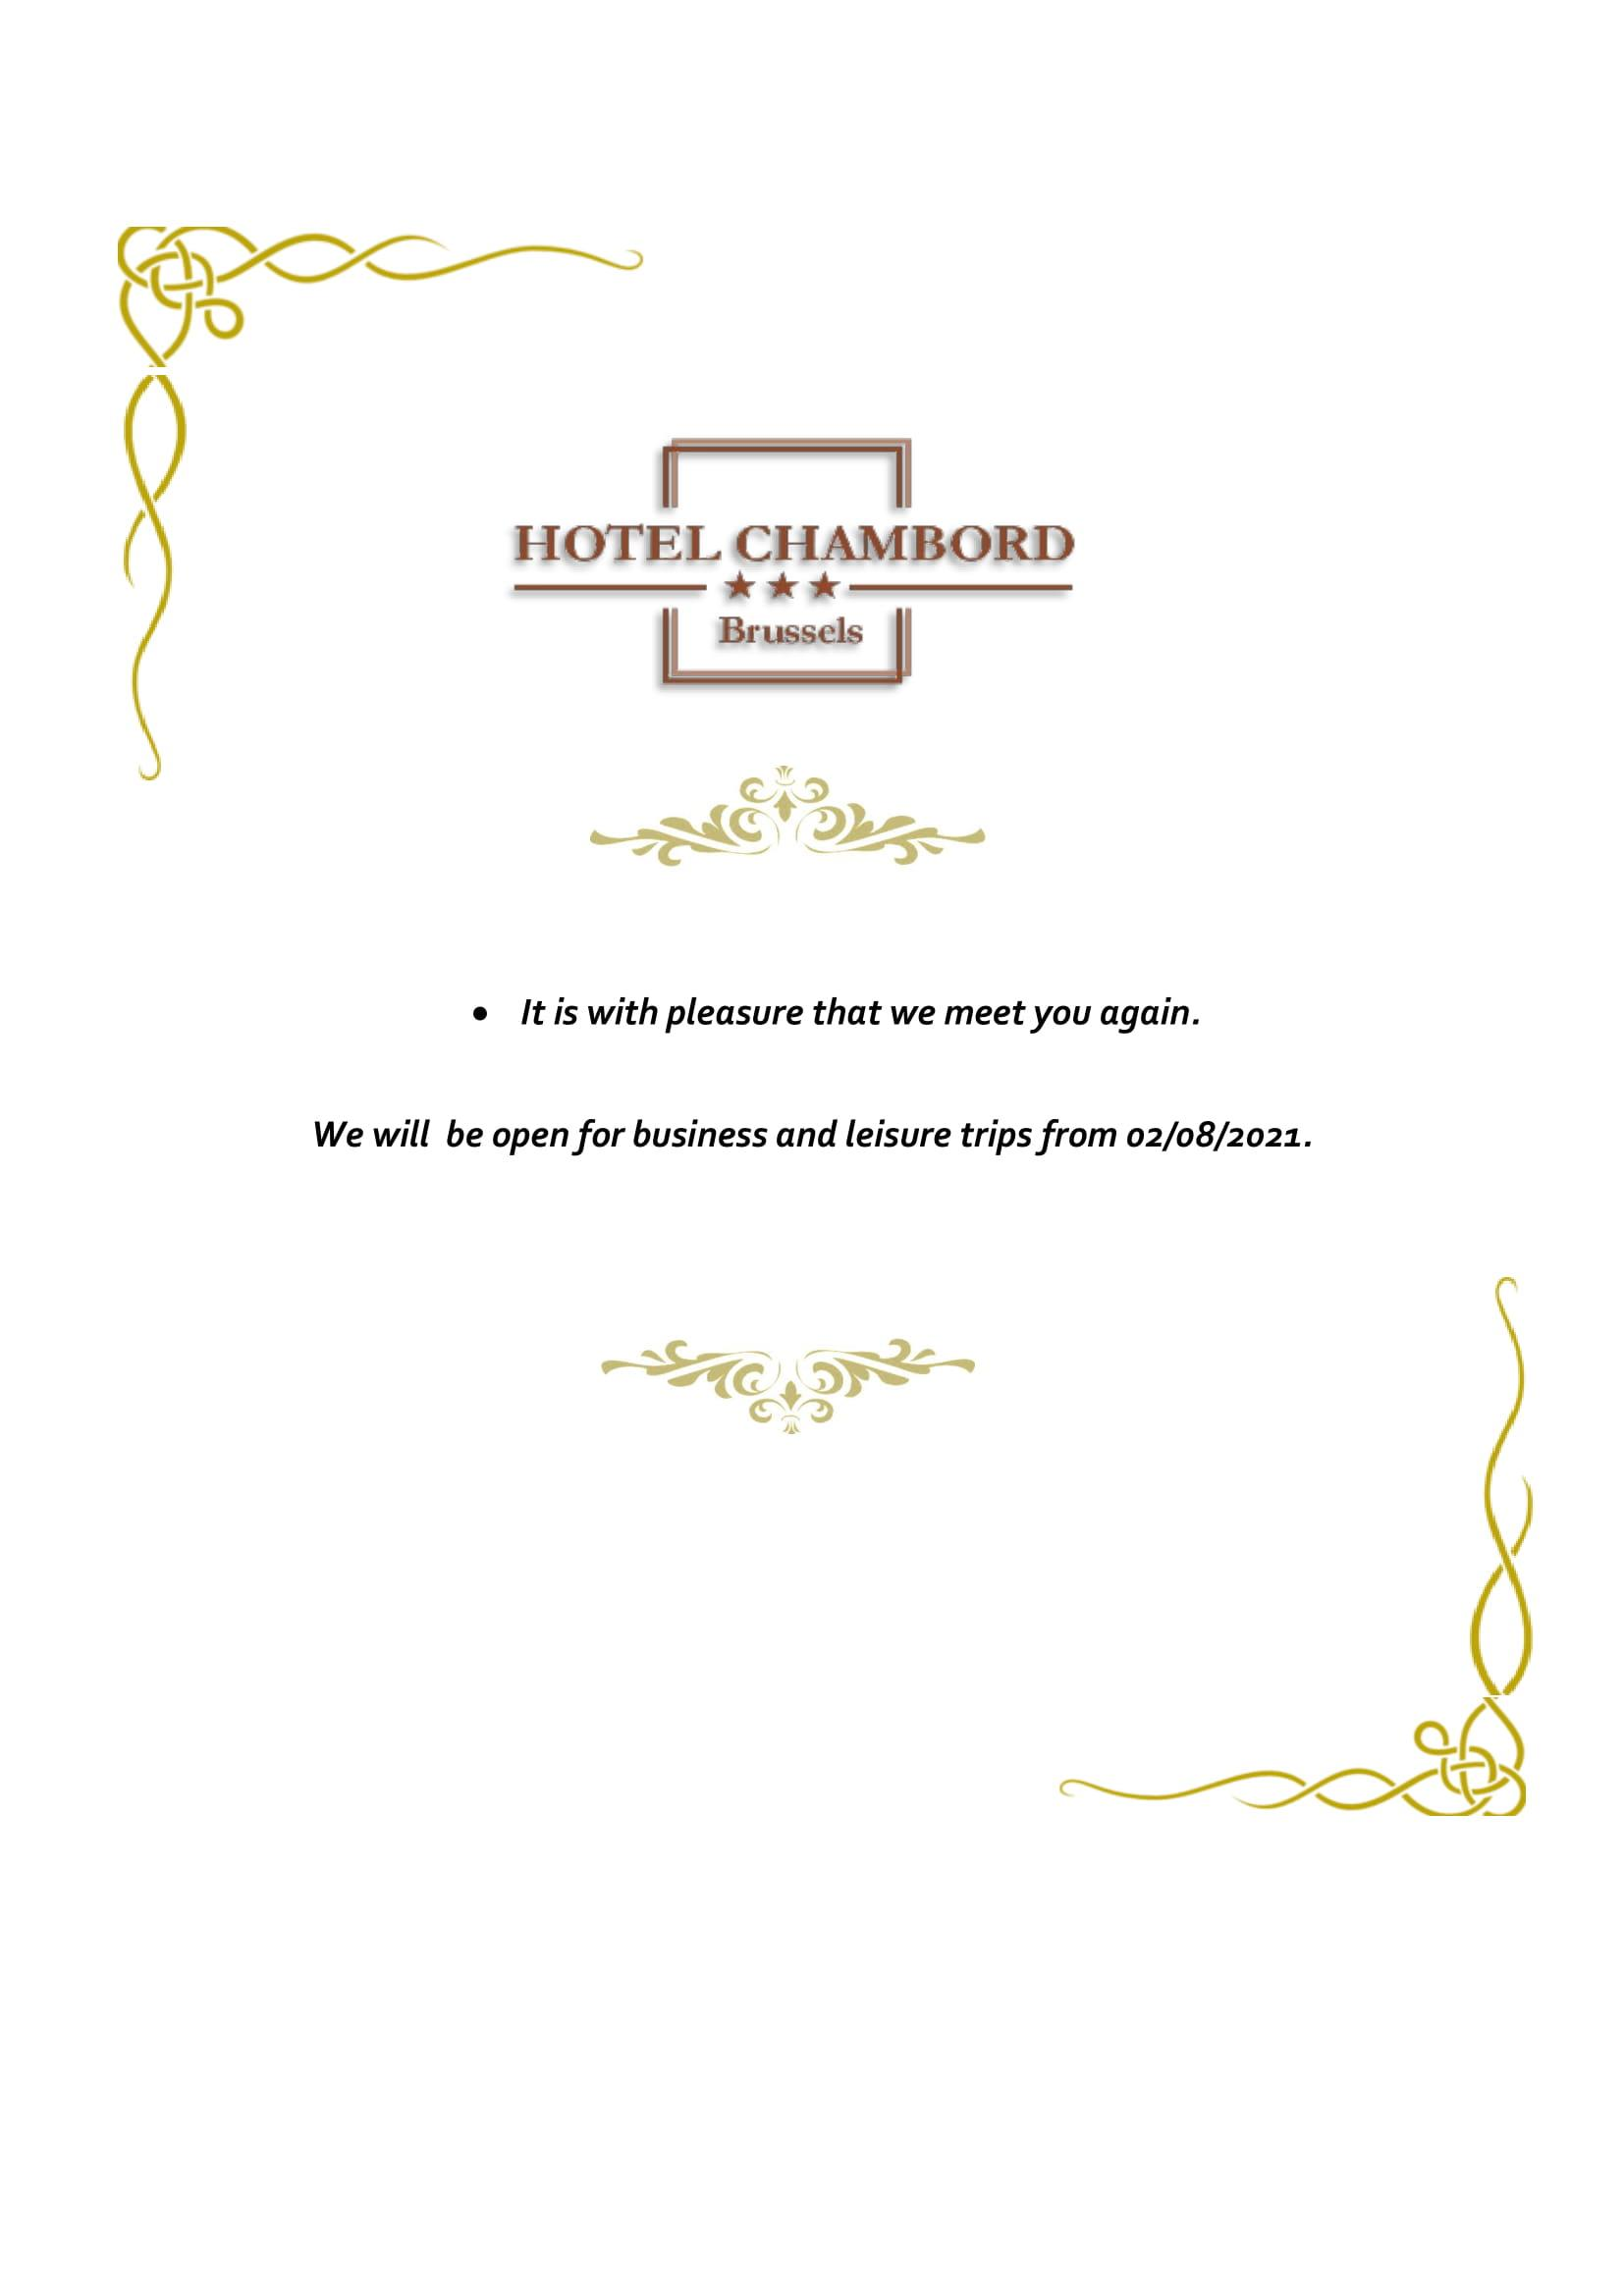 Hôtel Chambord